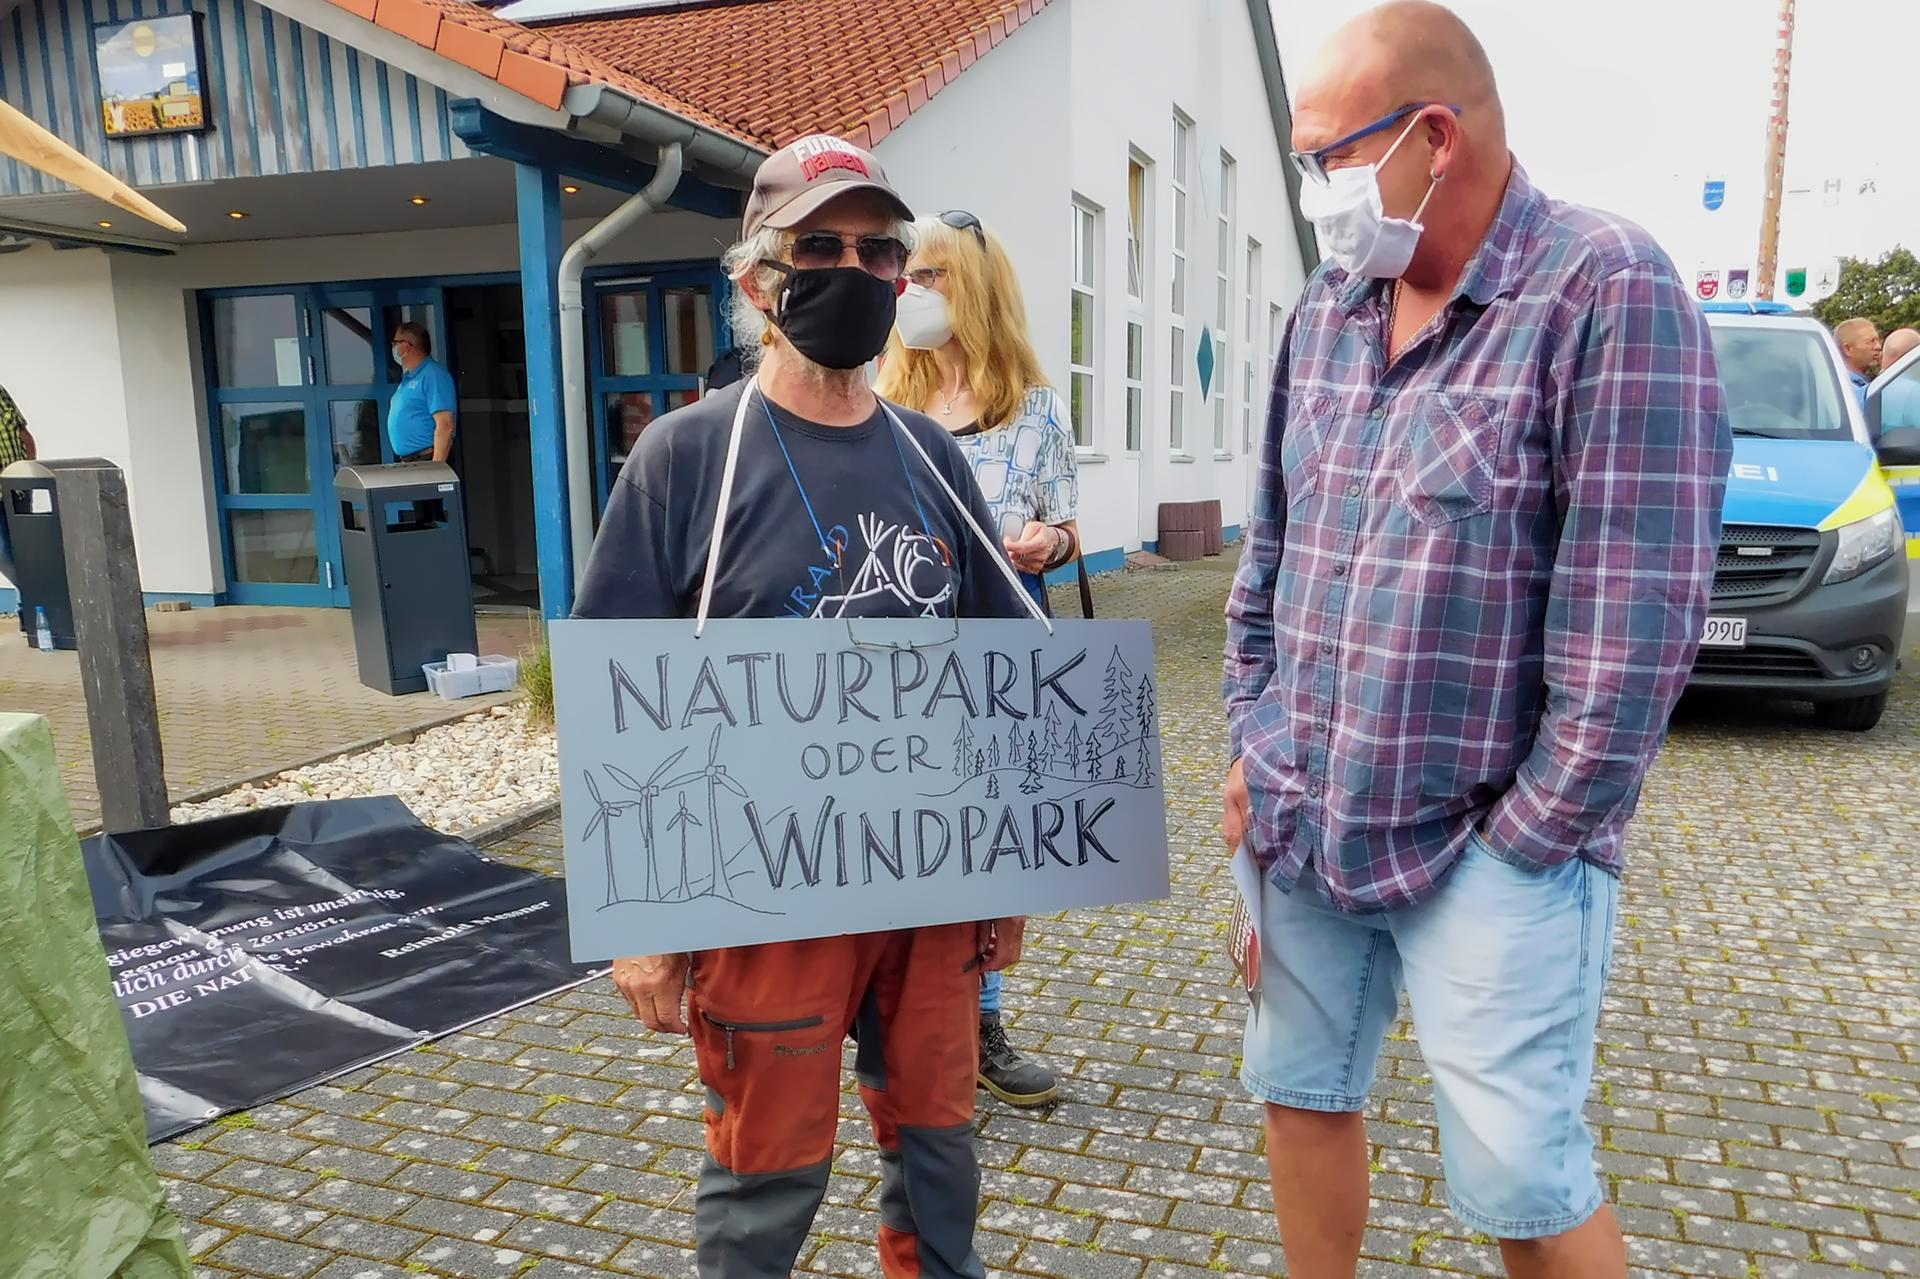 Naturpark oder Windpark